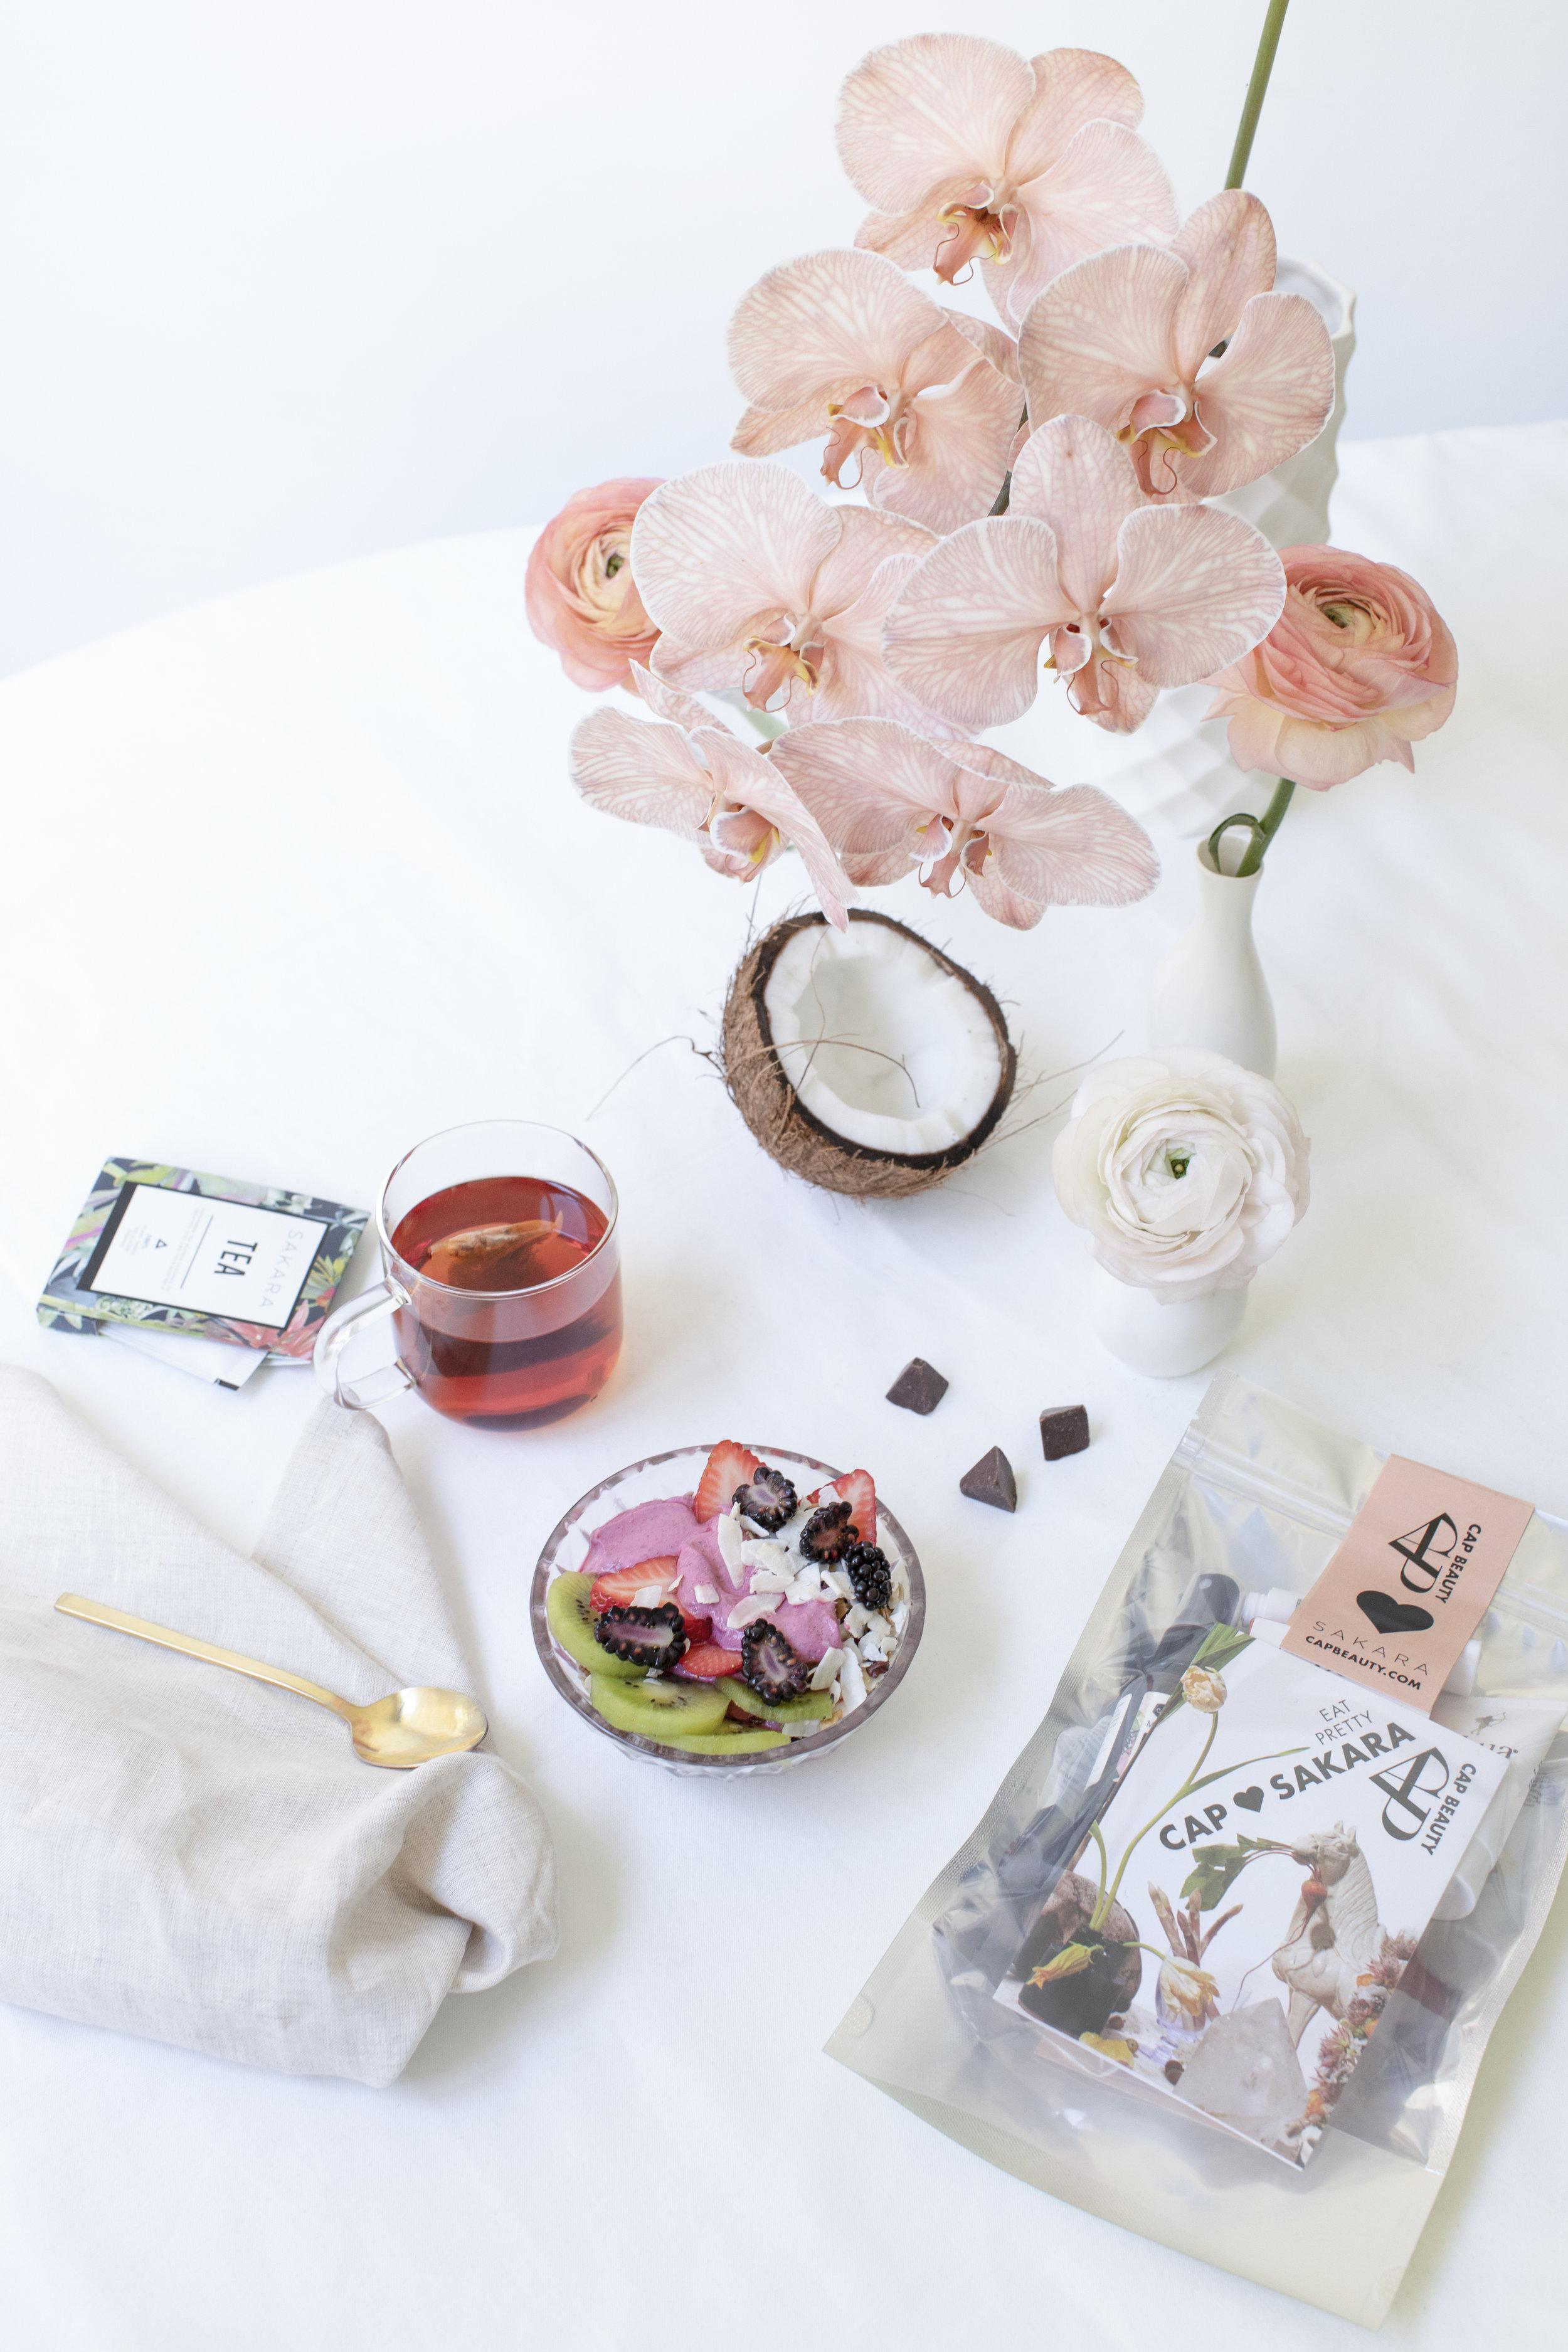 Sakara Life_Eat Pretty_kaui_smoothie_bowl_with_kit.jpg